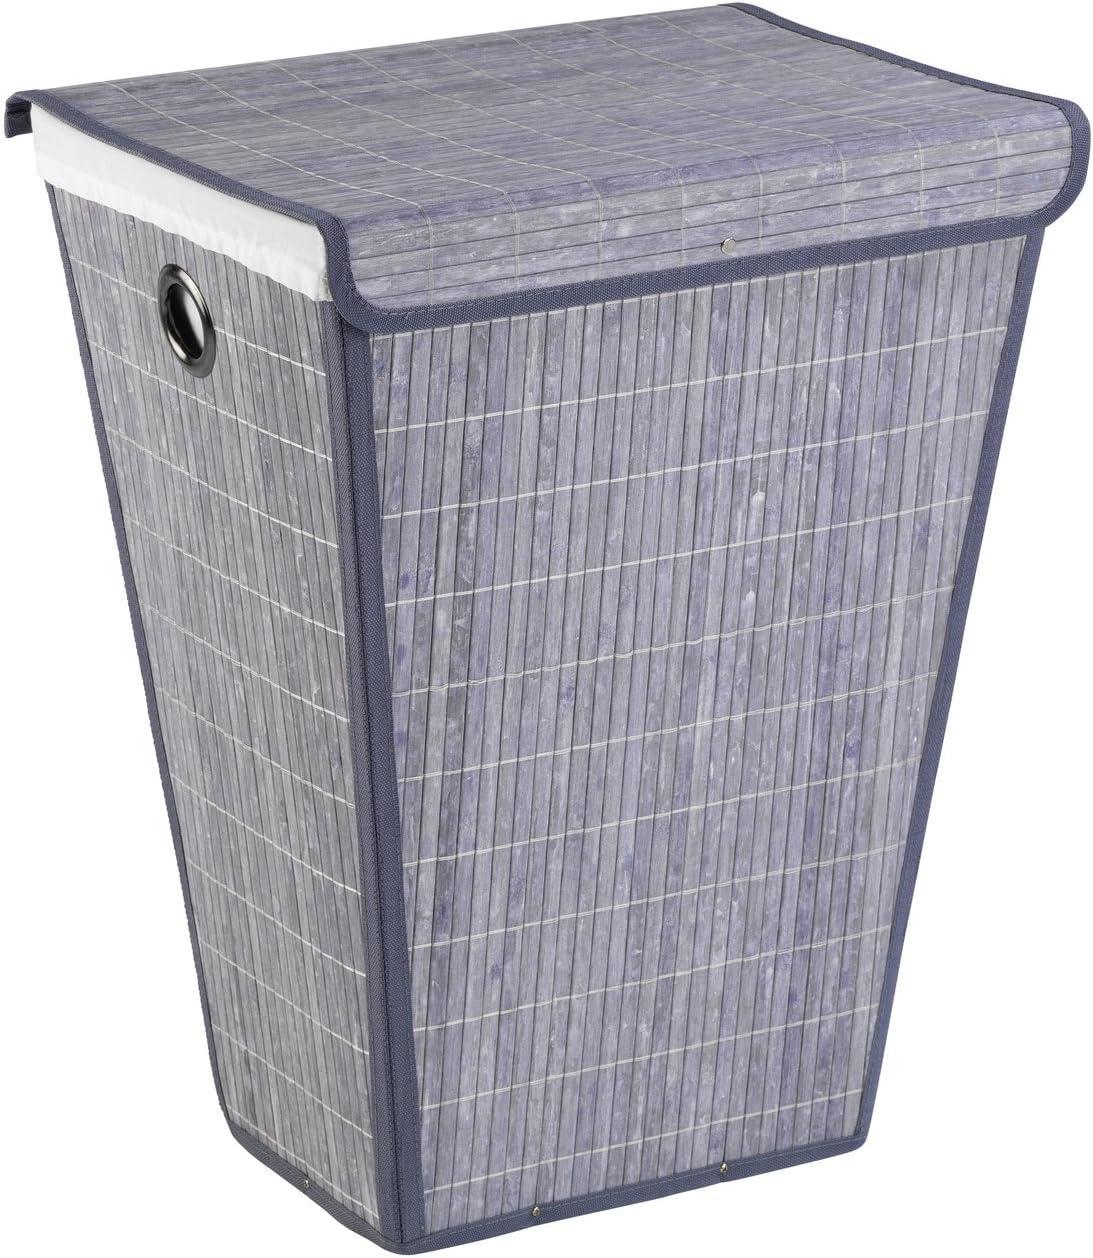 Opening large release sale WENKO Bamboo mart Laundry Bin Grey